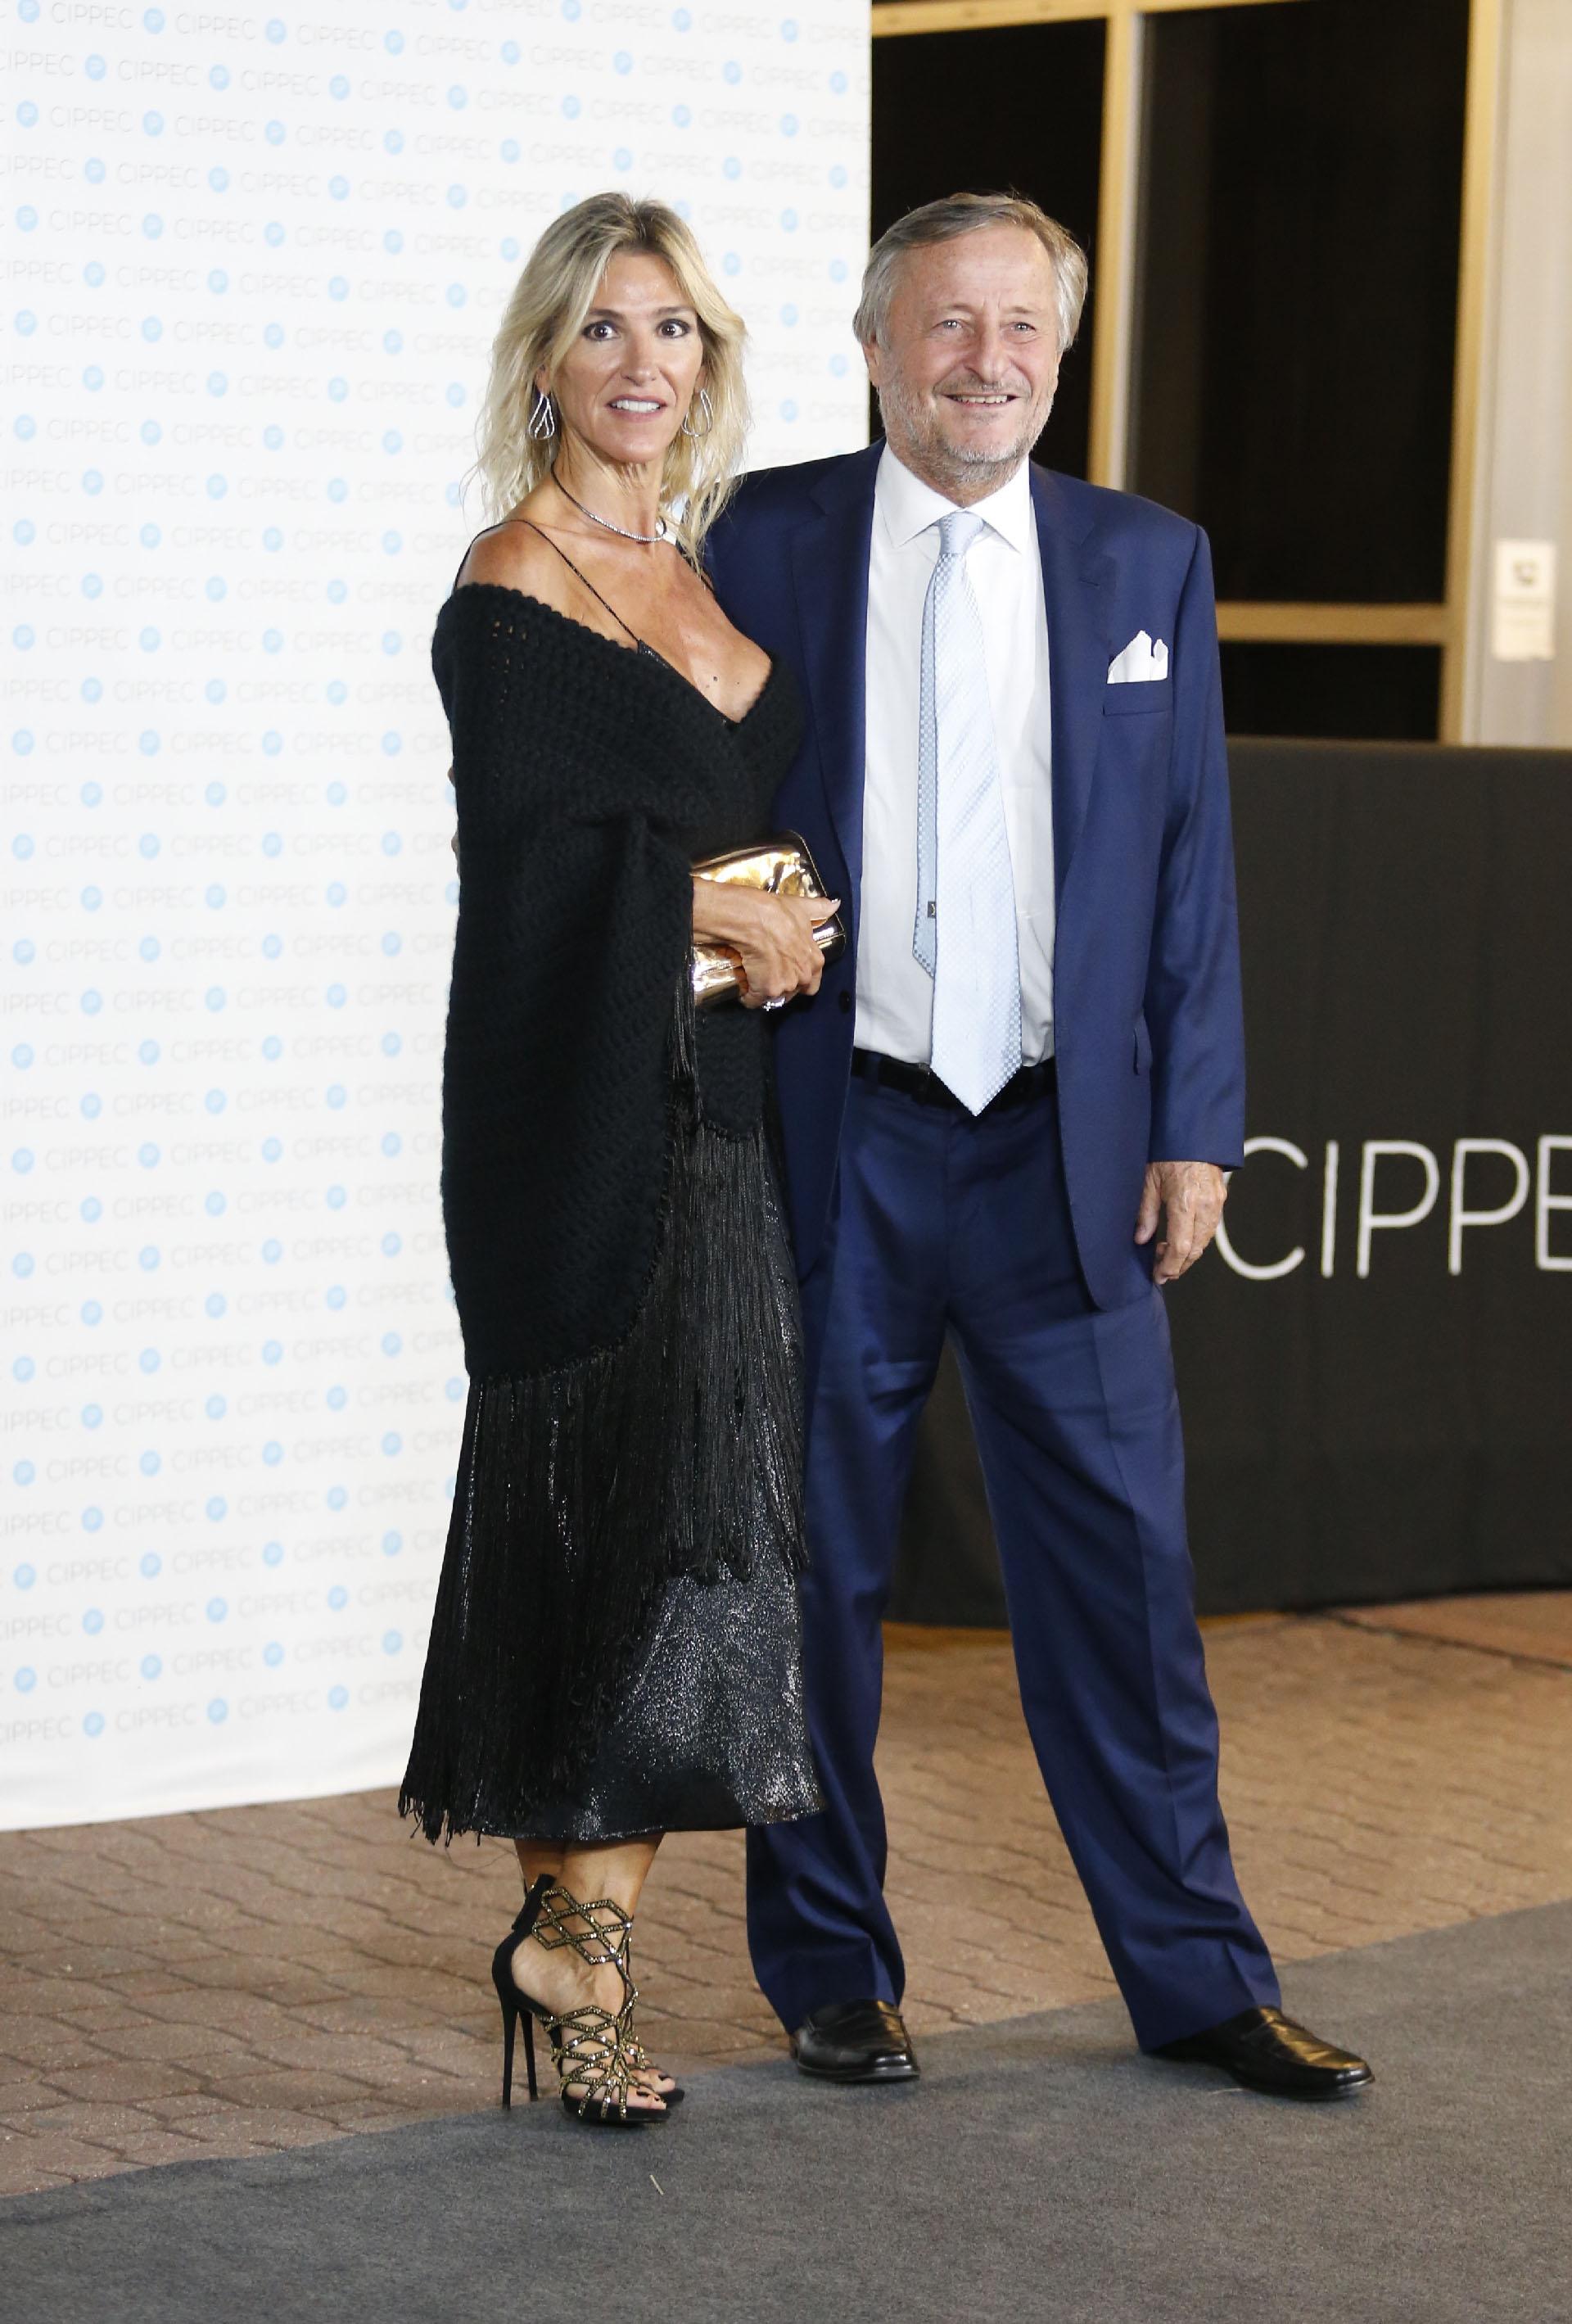 El presidente de FIAT Artgentina, Cristiano Rattazzi, y su pareja Gabriela Castellani